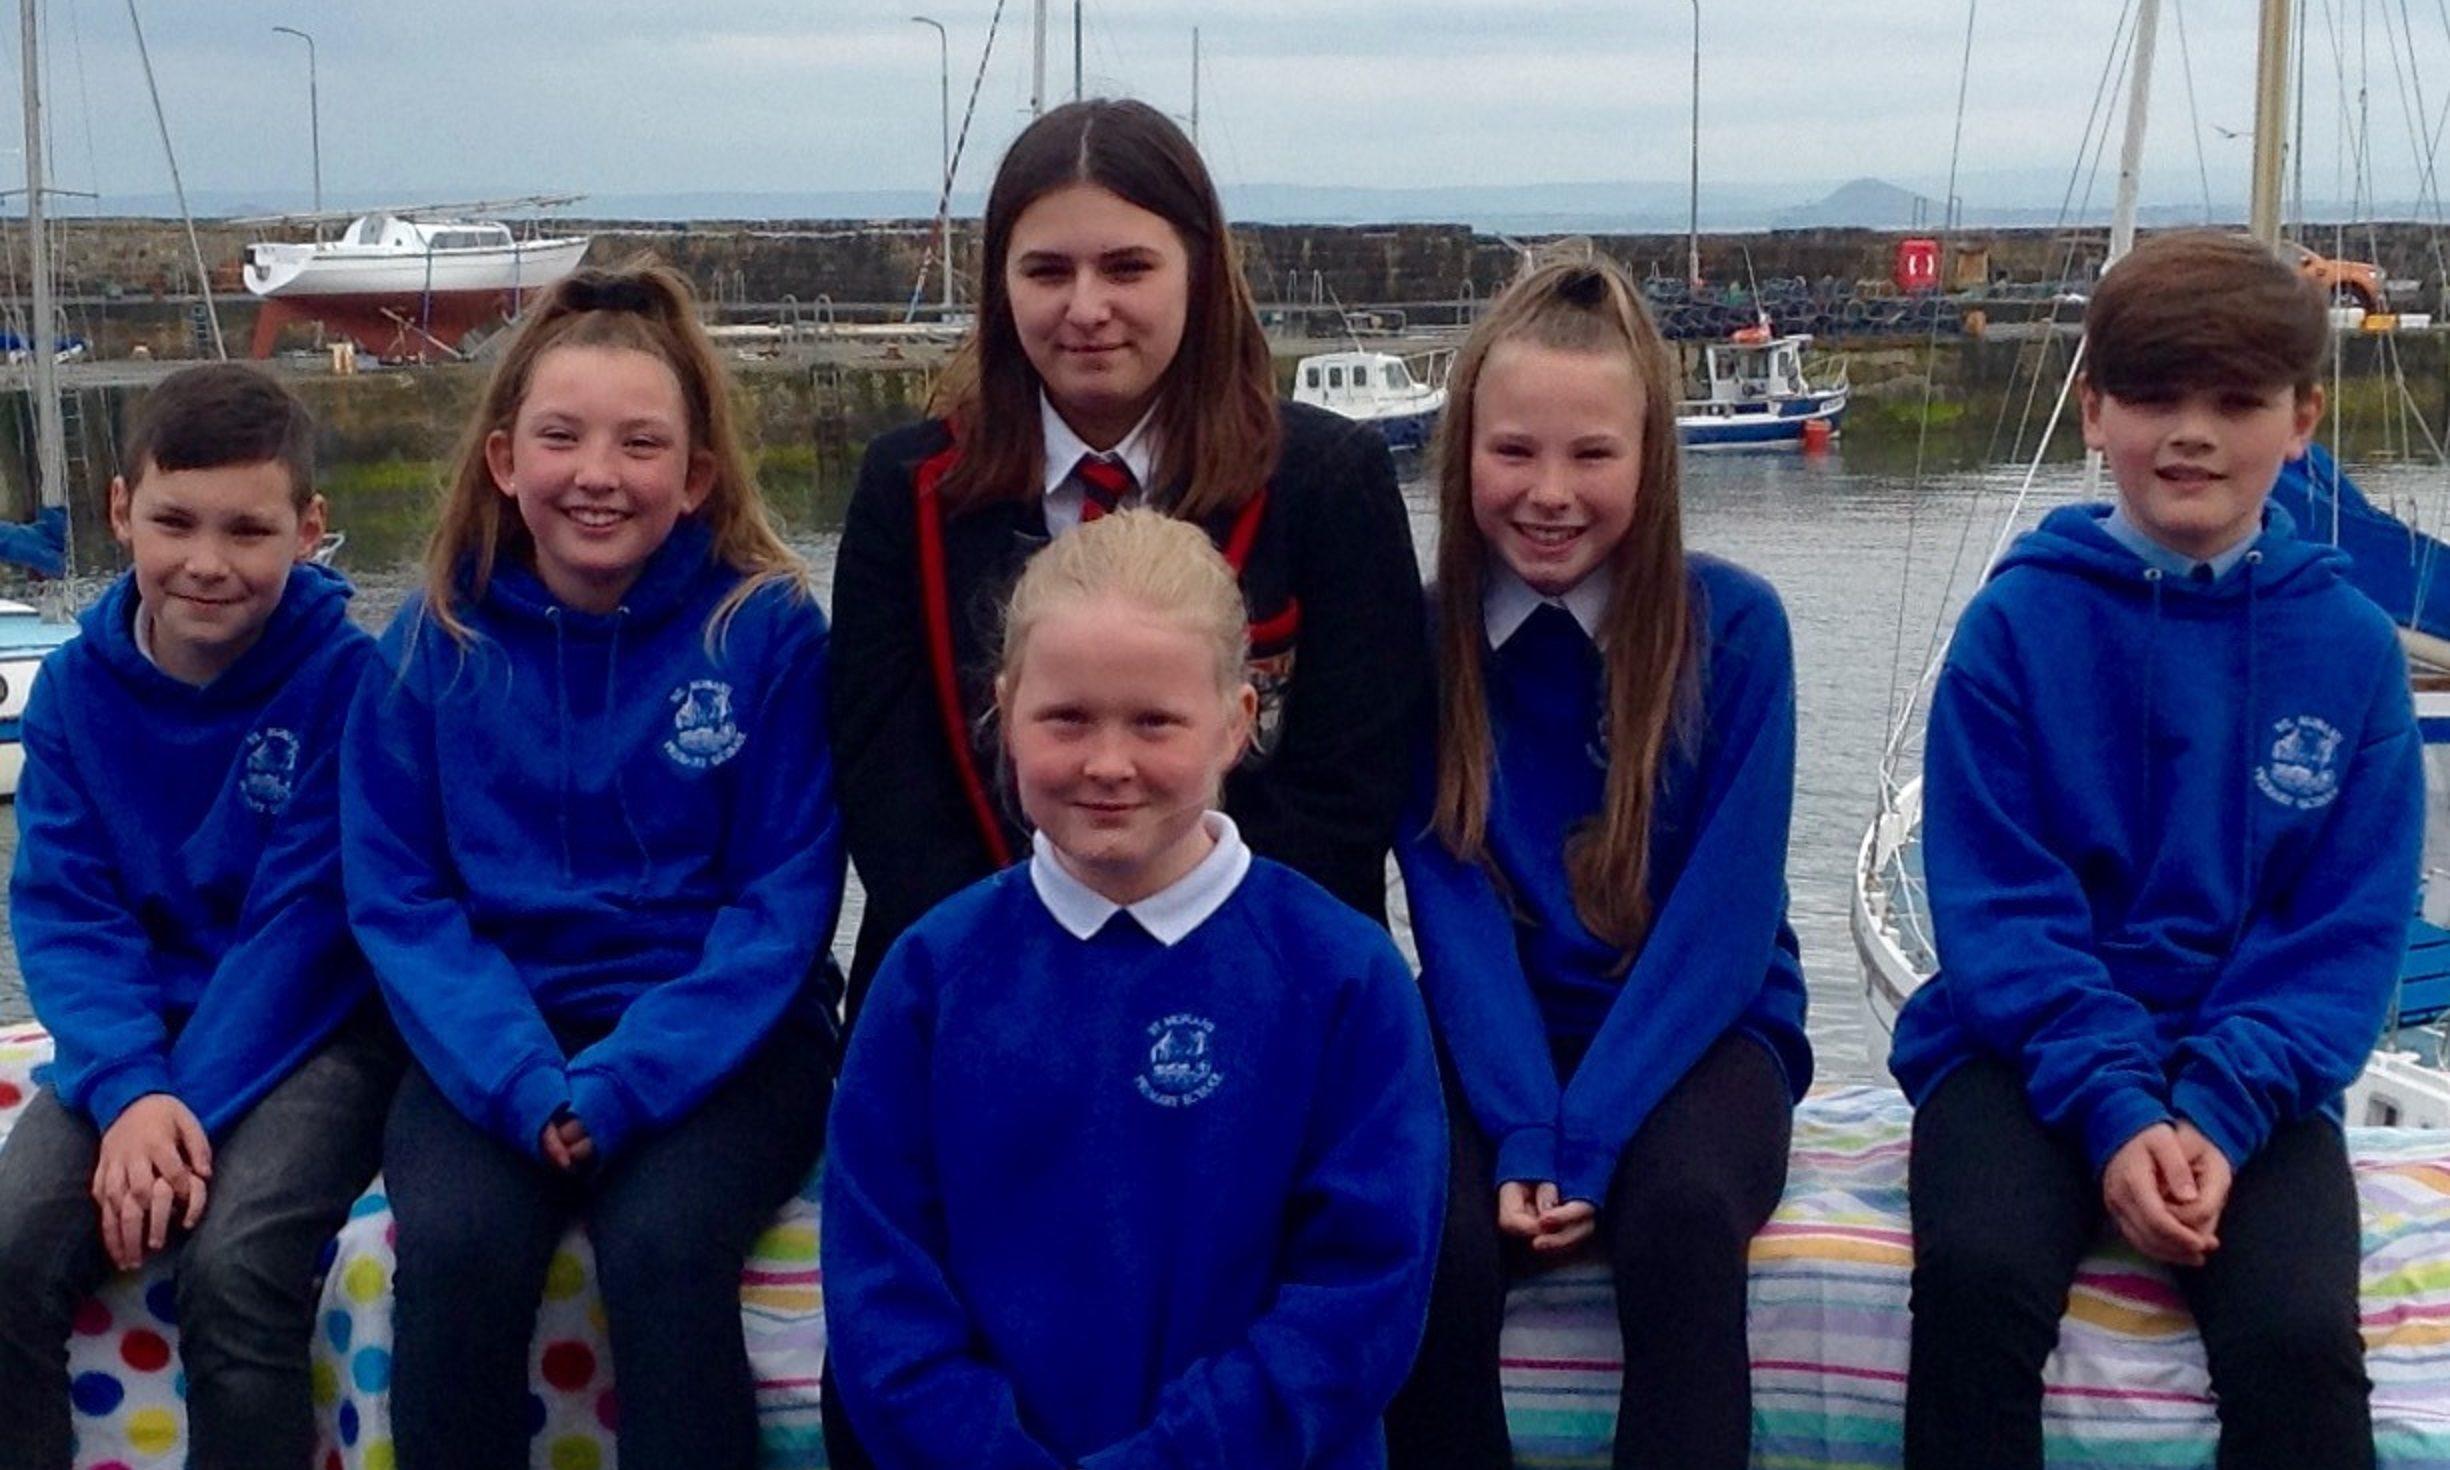 This years sea queen Mya Horsburgh, back centre, with Robert McNally, Georgia Syme, Erin Clarke, Aron Kelly, Danielle Robertson